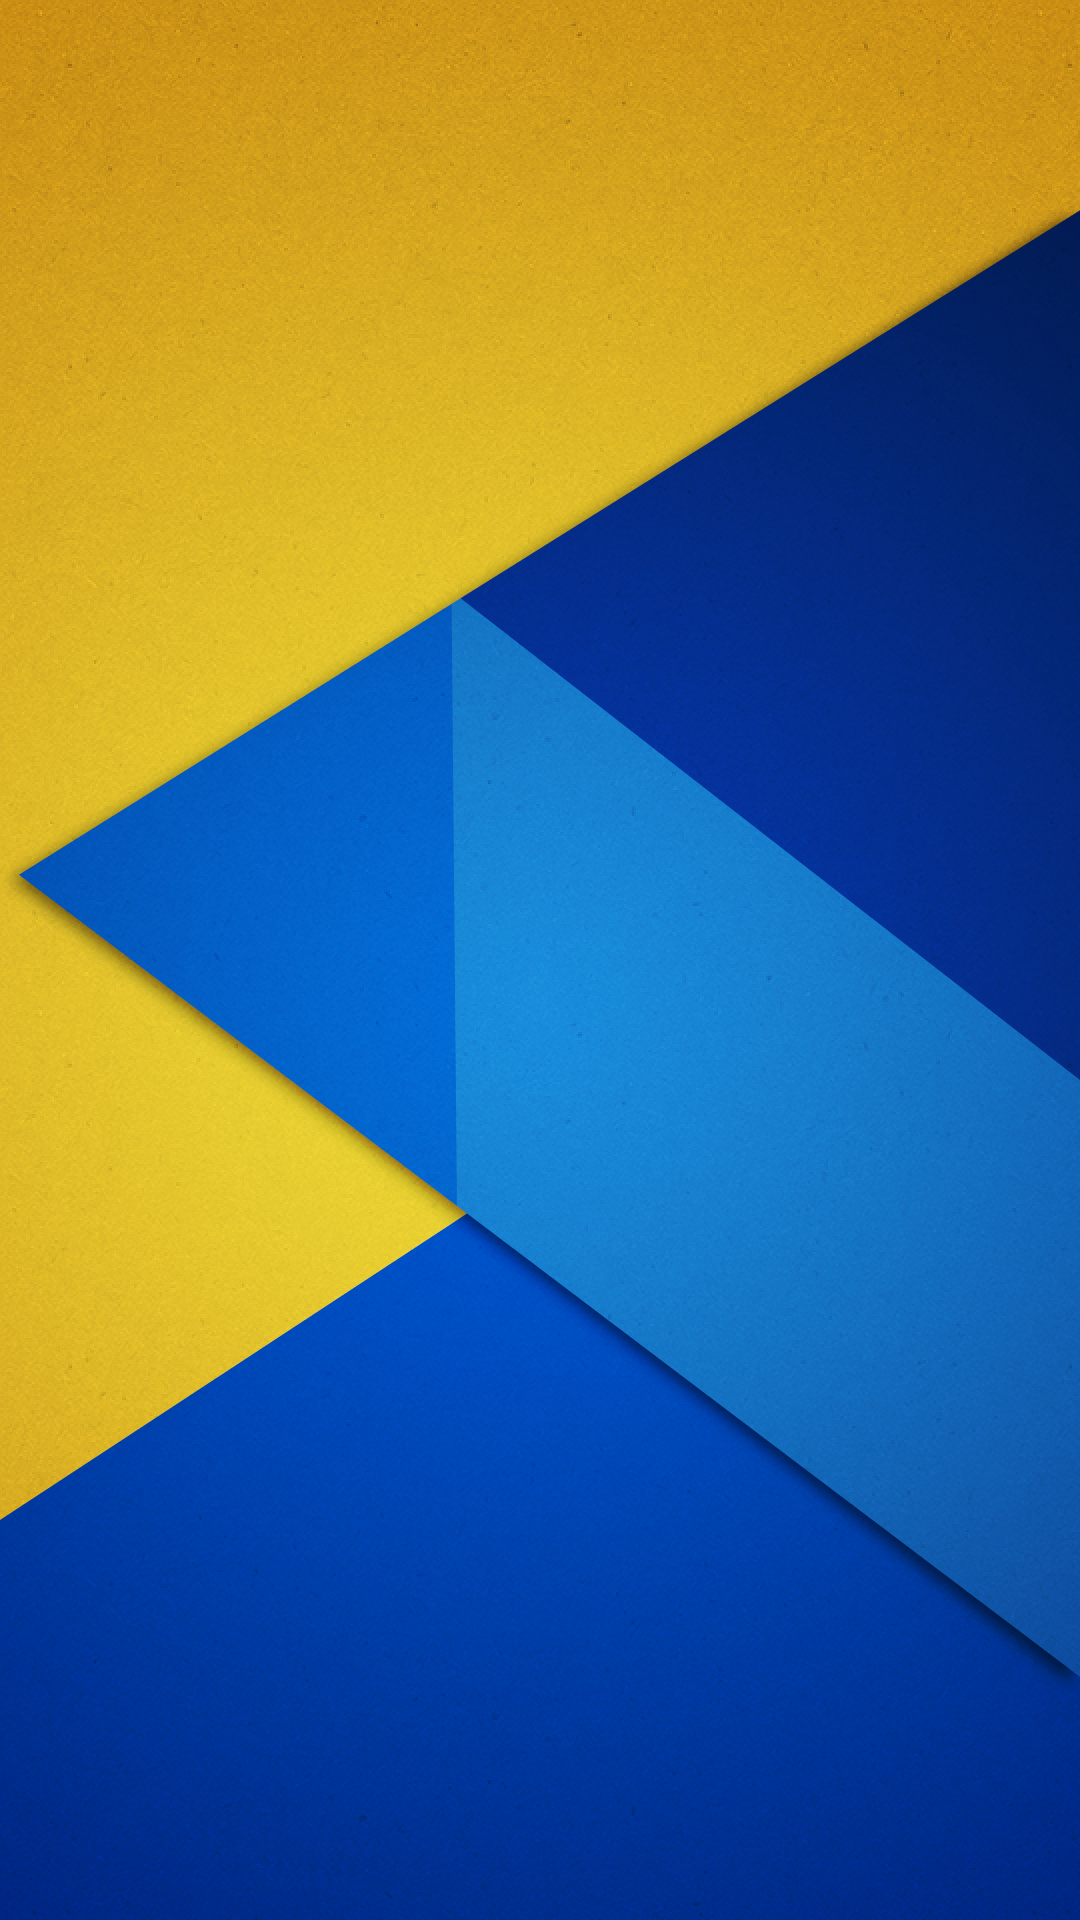 Abo Hani Android 6 0 Marshmallow Inspired Wallpapers Android Marshmallow Wallpaper Hd 1080p 1080x1920 Wallpaper Teahub Io